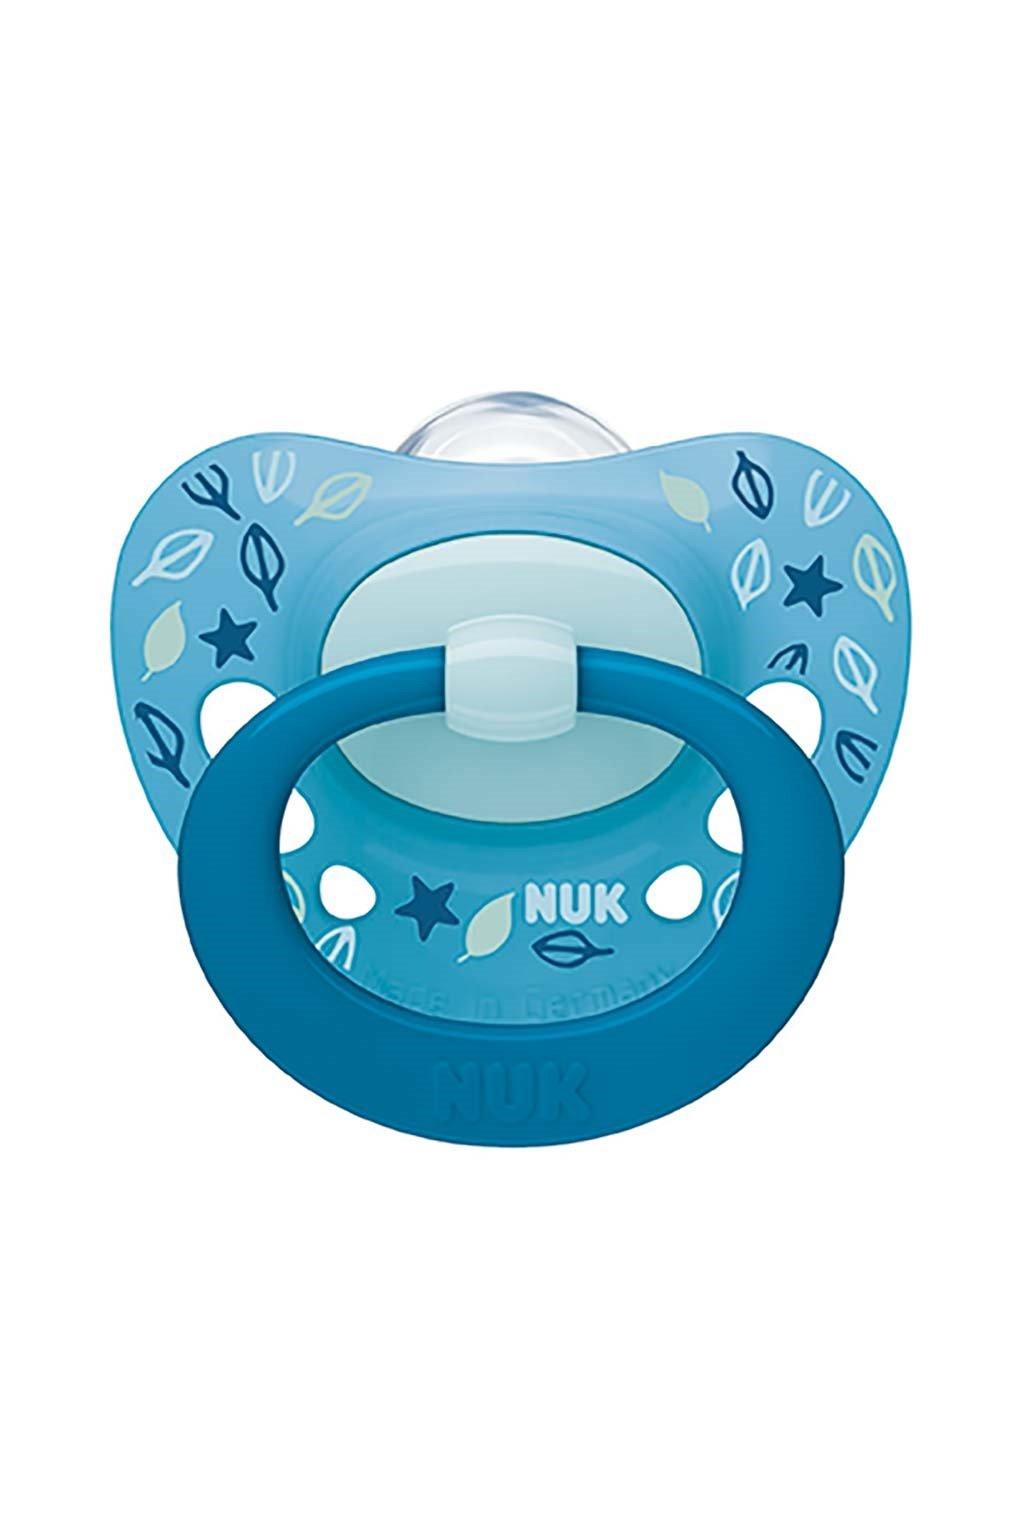 Dojčenský cumlík NUK Classic Signature 18-36m modrý